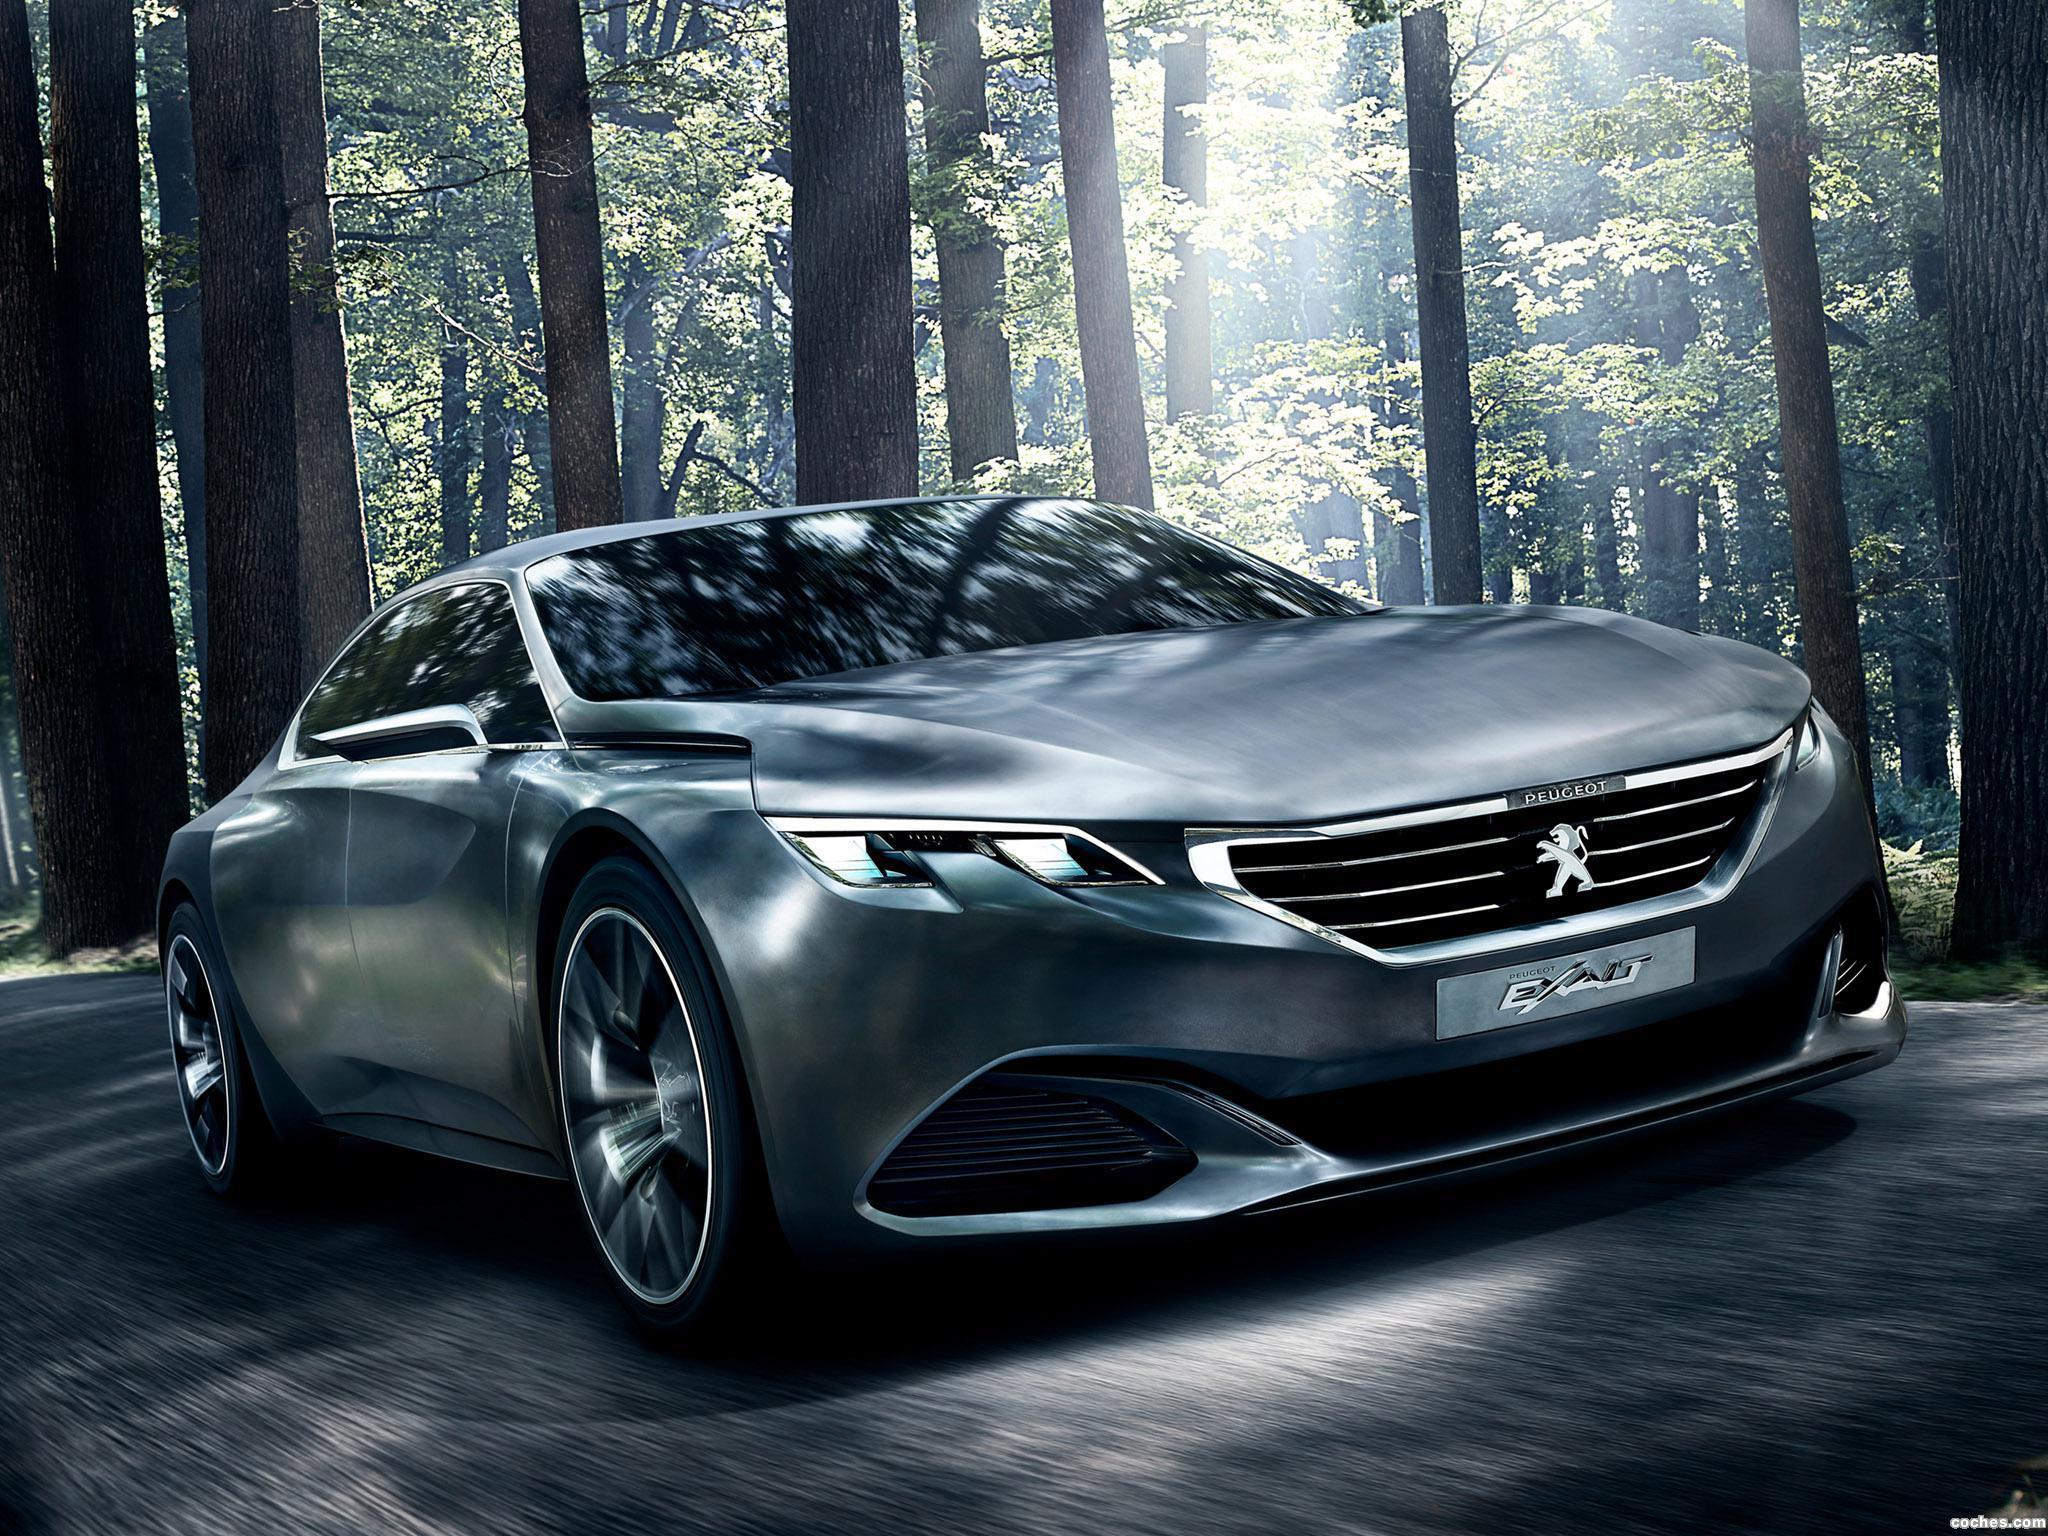 Foto 0 de Peugeot Exalt Paris Concept 2014